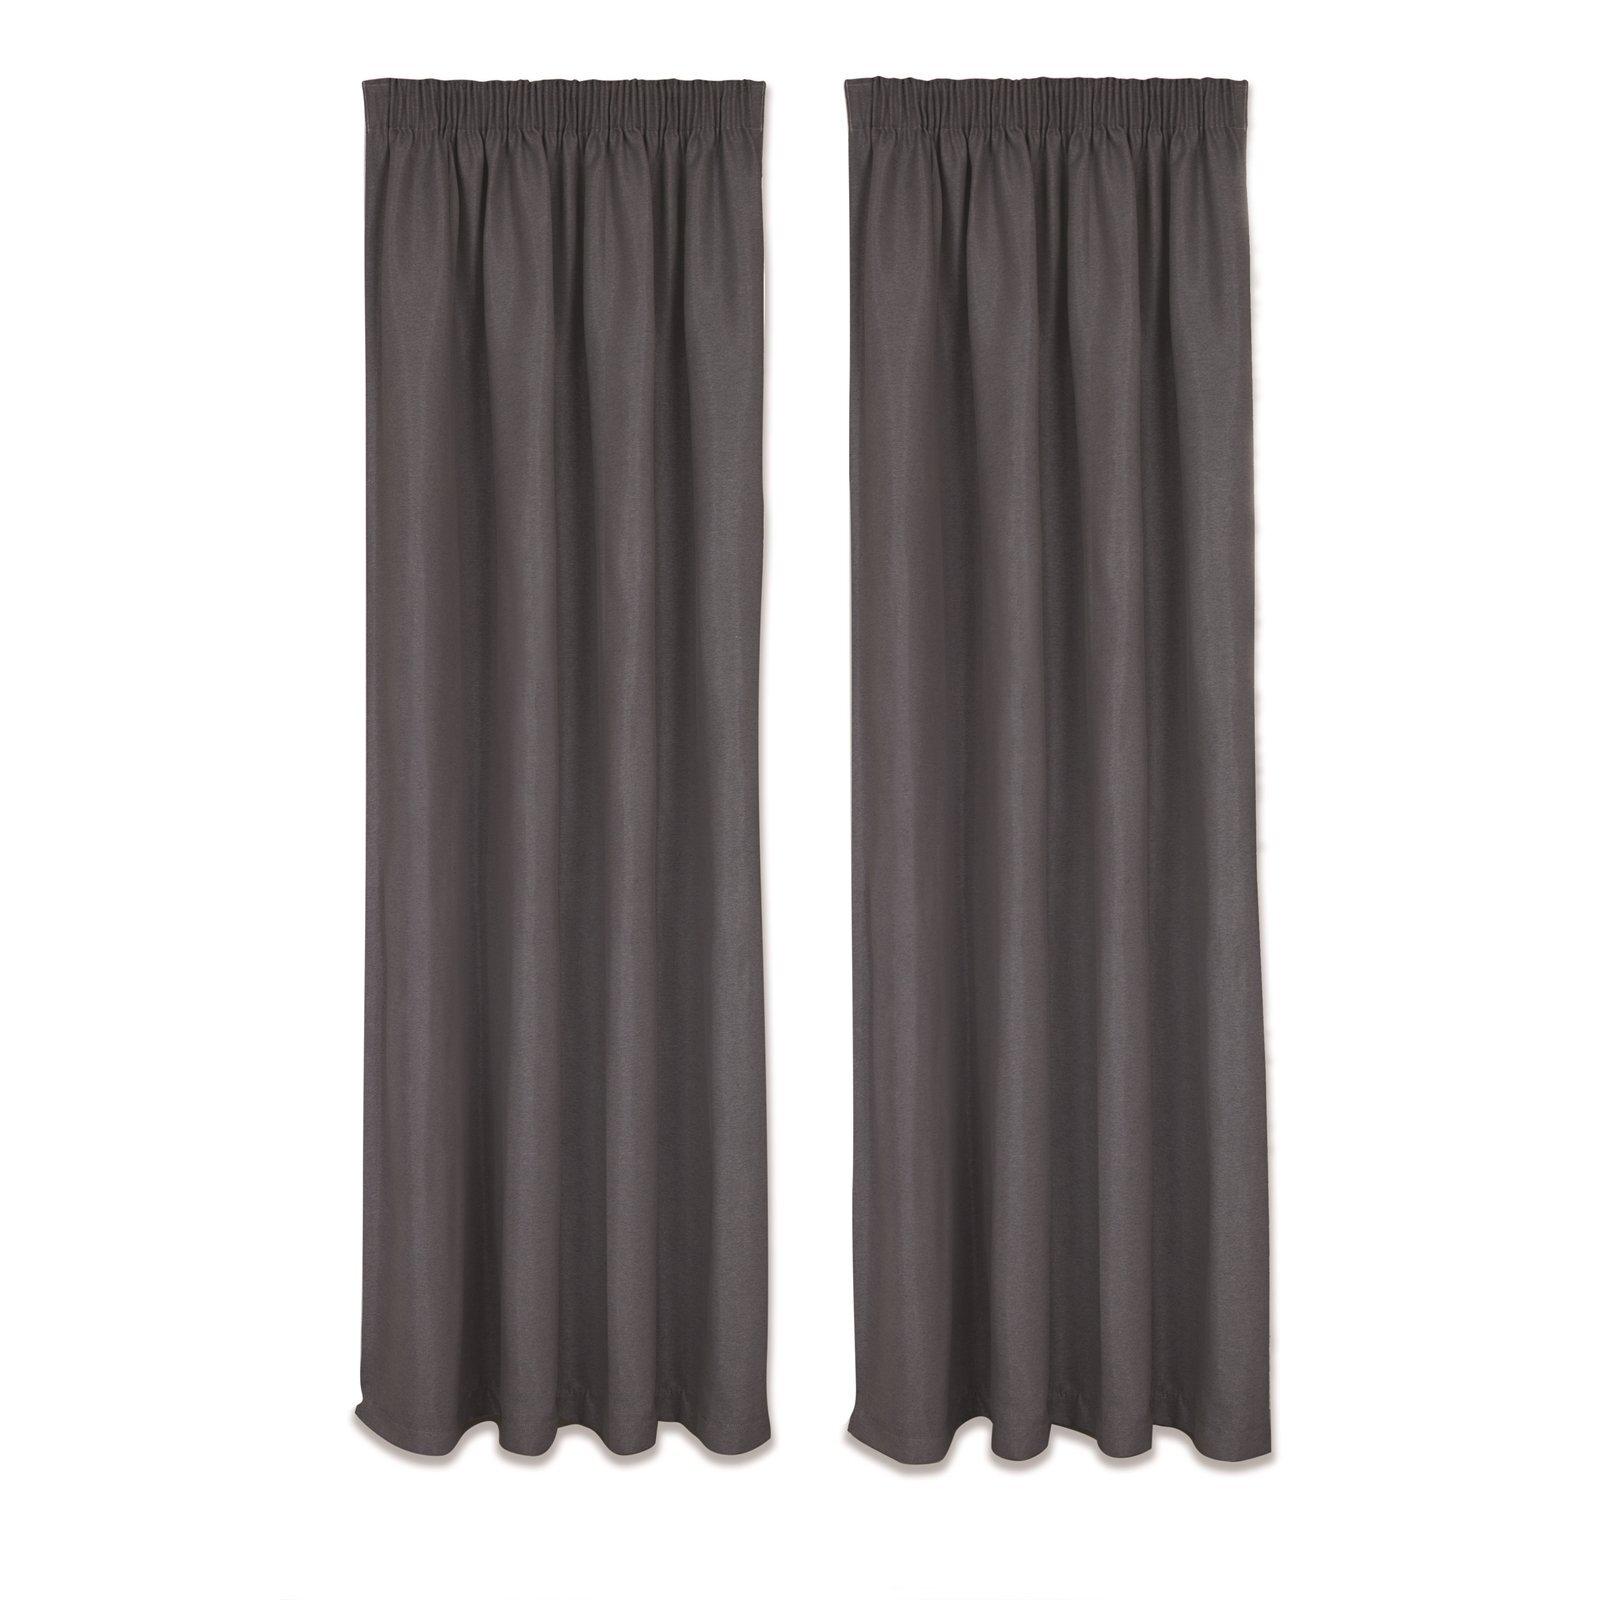 Home Profile 2.3 - 3 x 1.6m Berlin Triple Weave Curtain